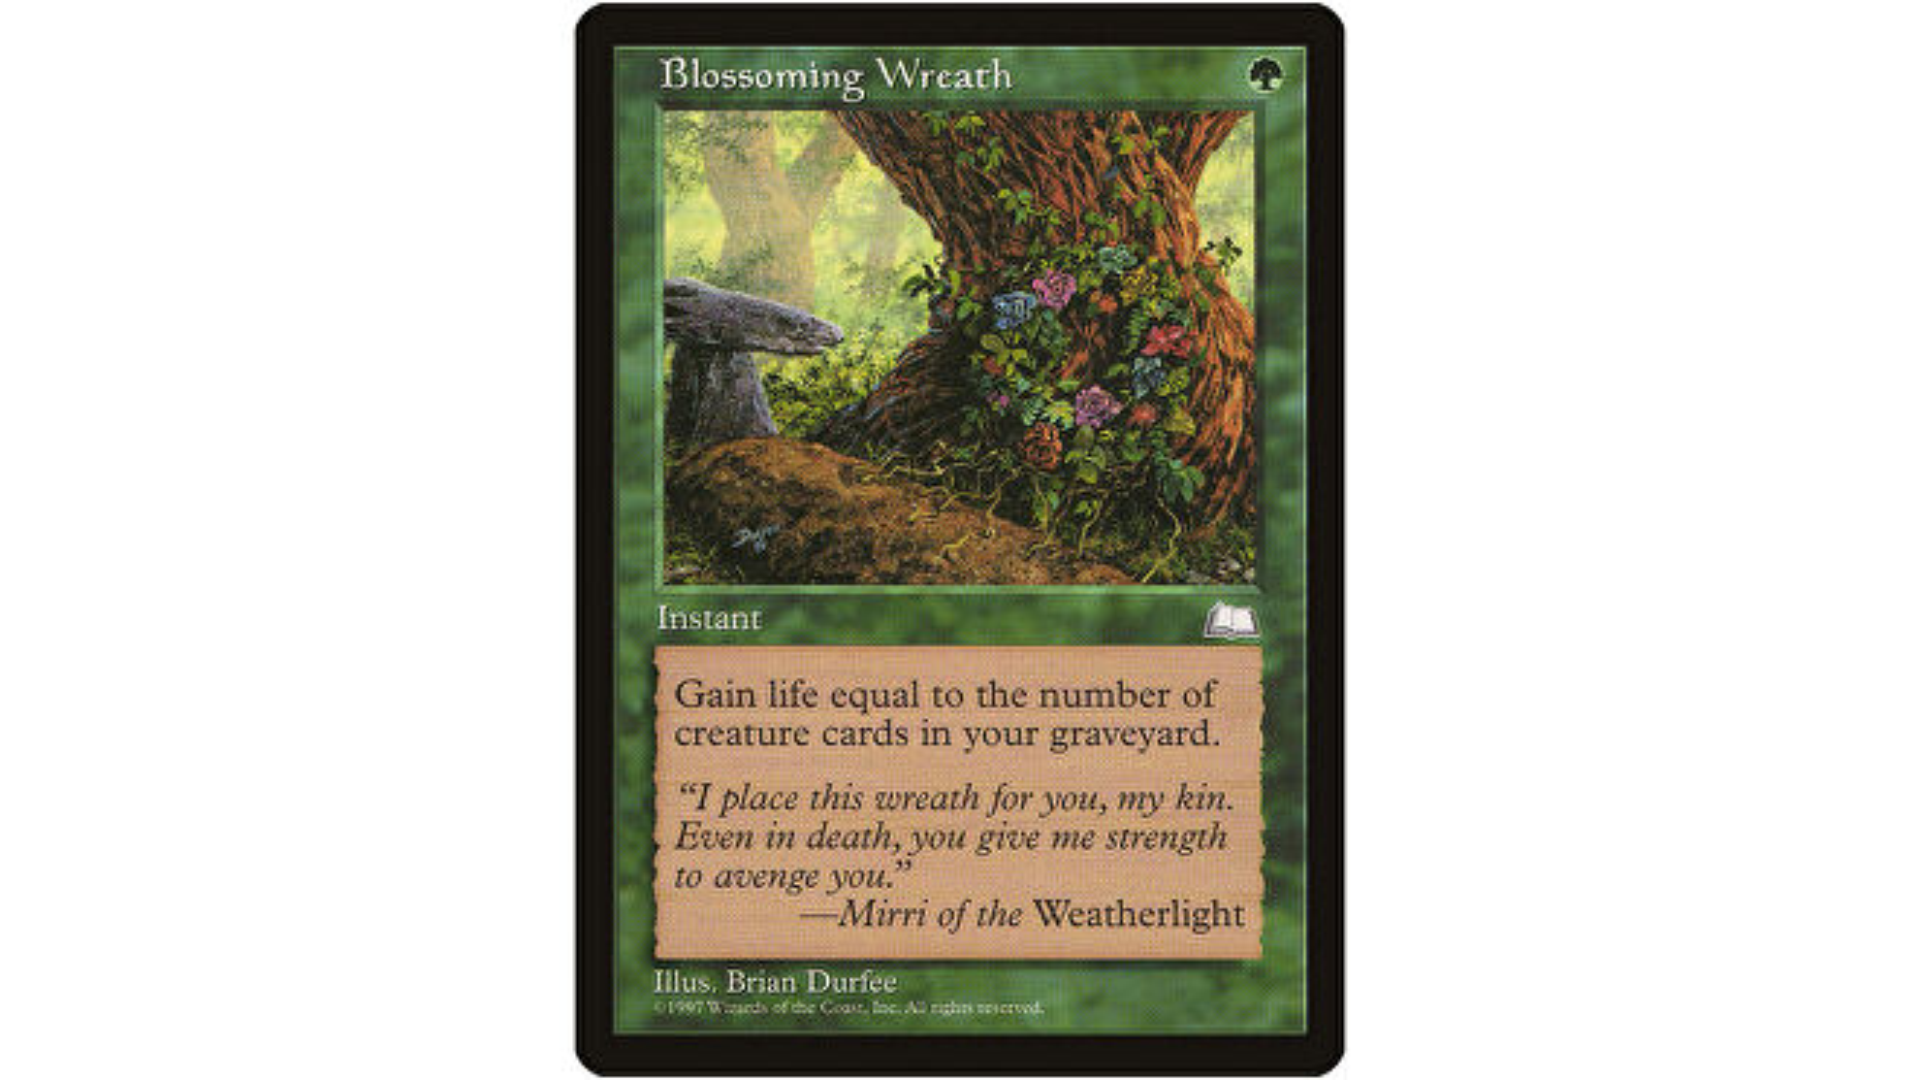 mtg-christmas-card-blossoming-wreath.jpg